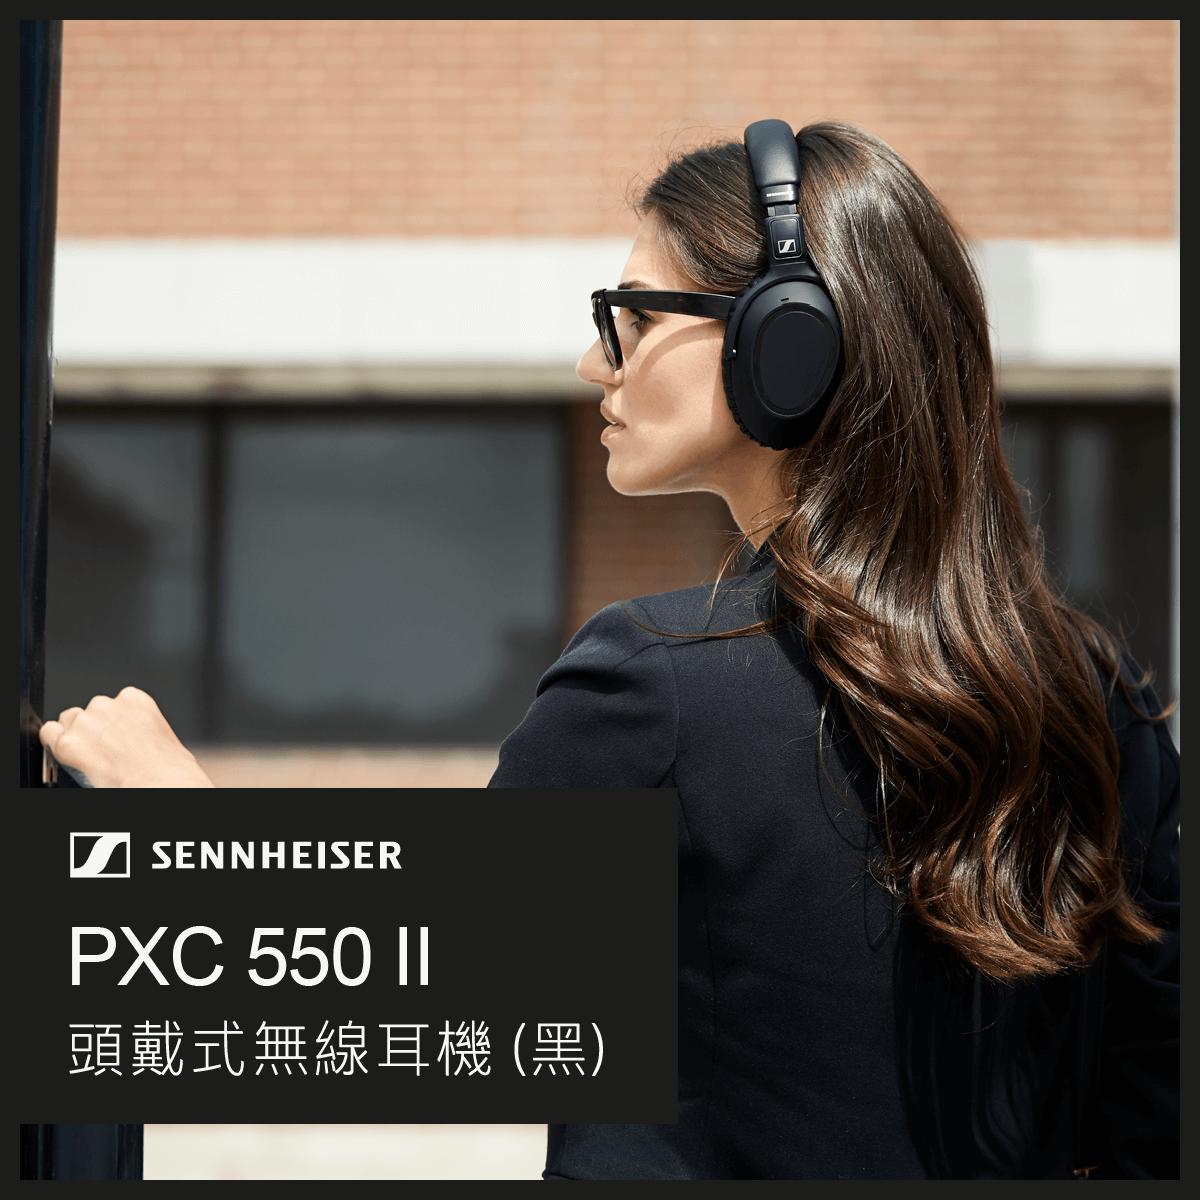 Sennheiser PXC 550 II